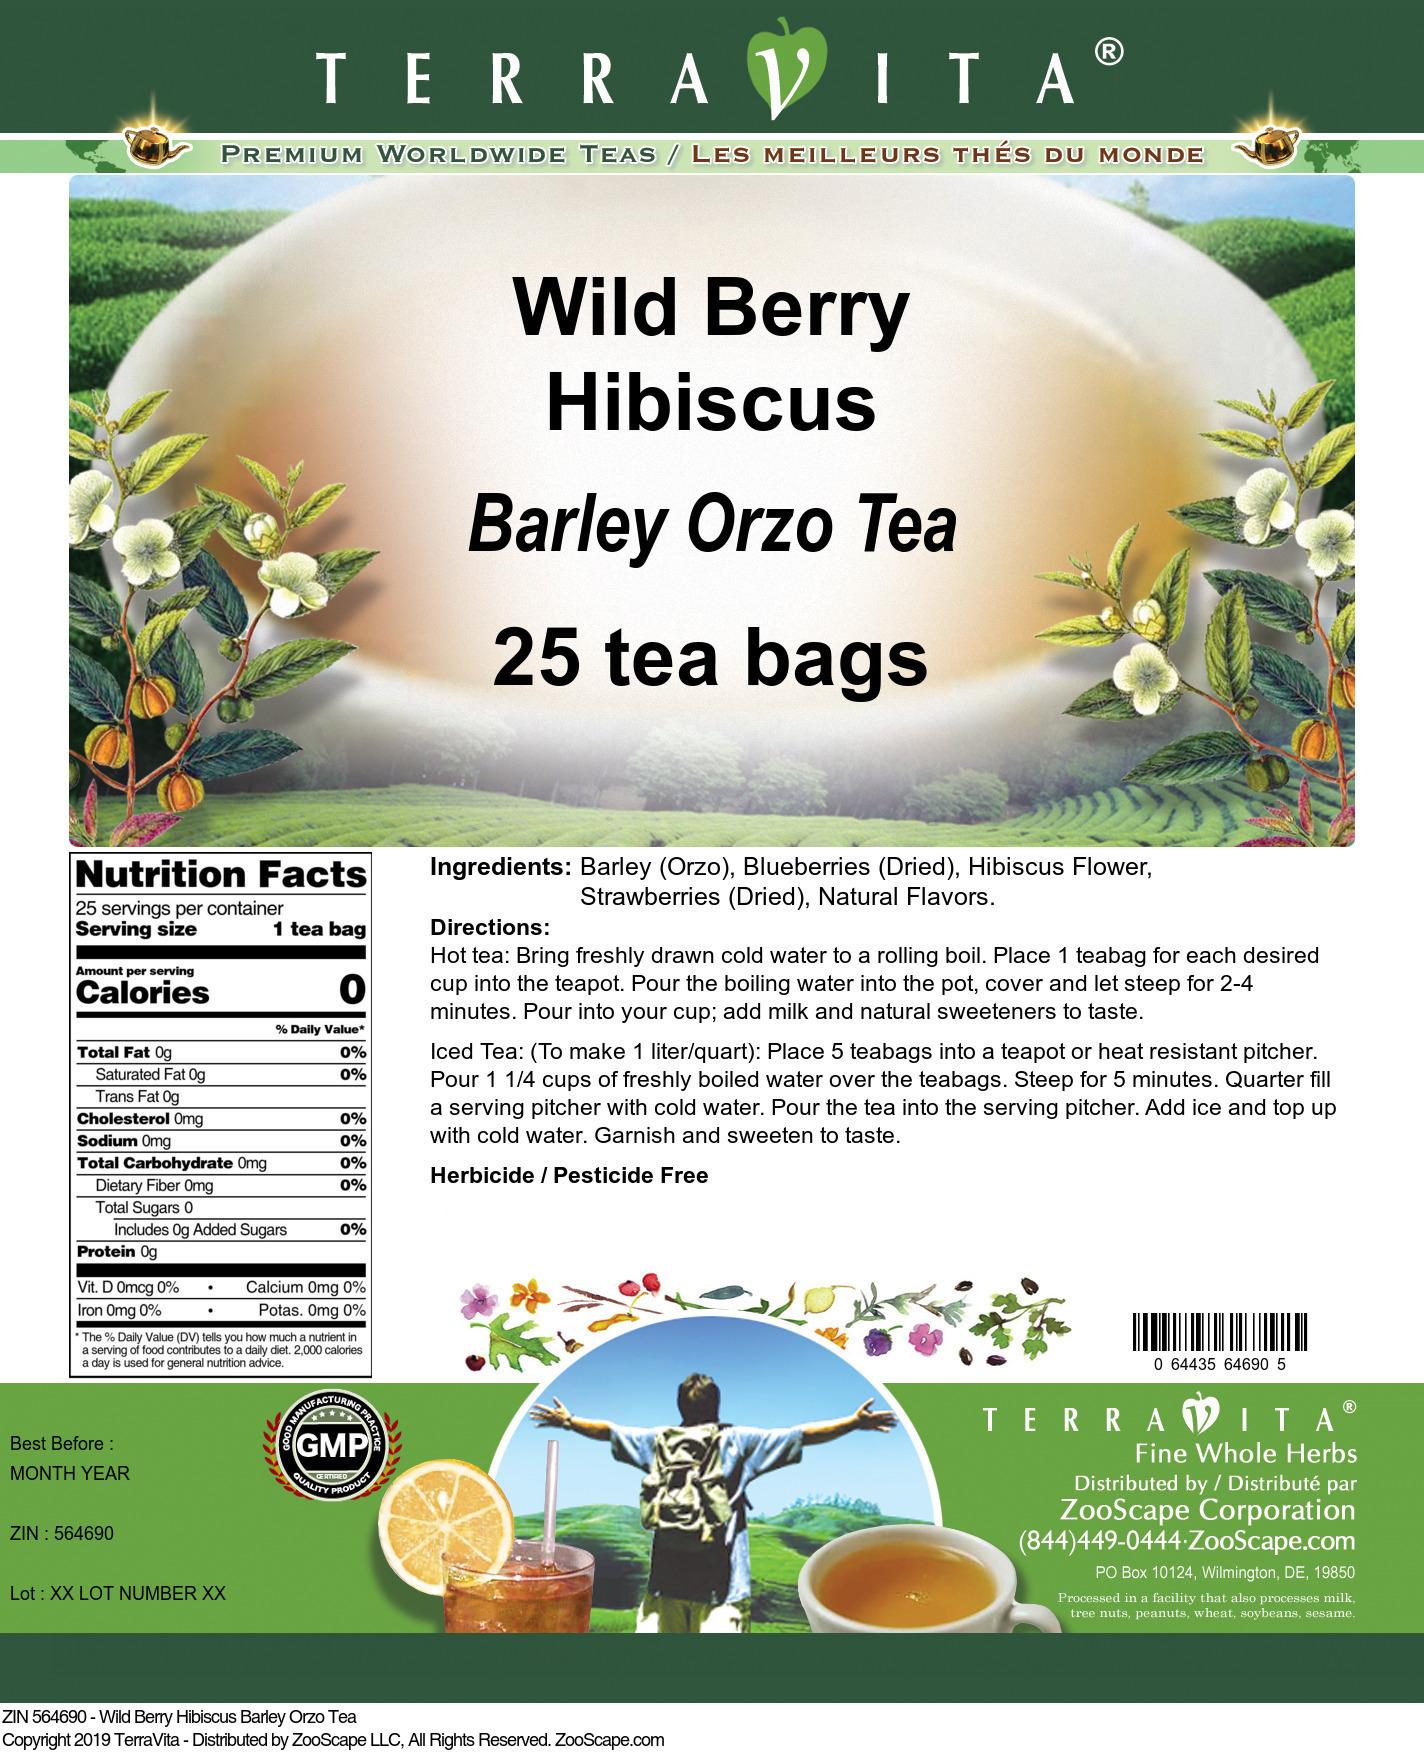 Wild Berry Hibiscus Barley Orzo Tea